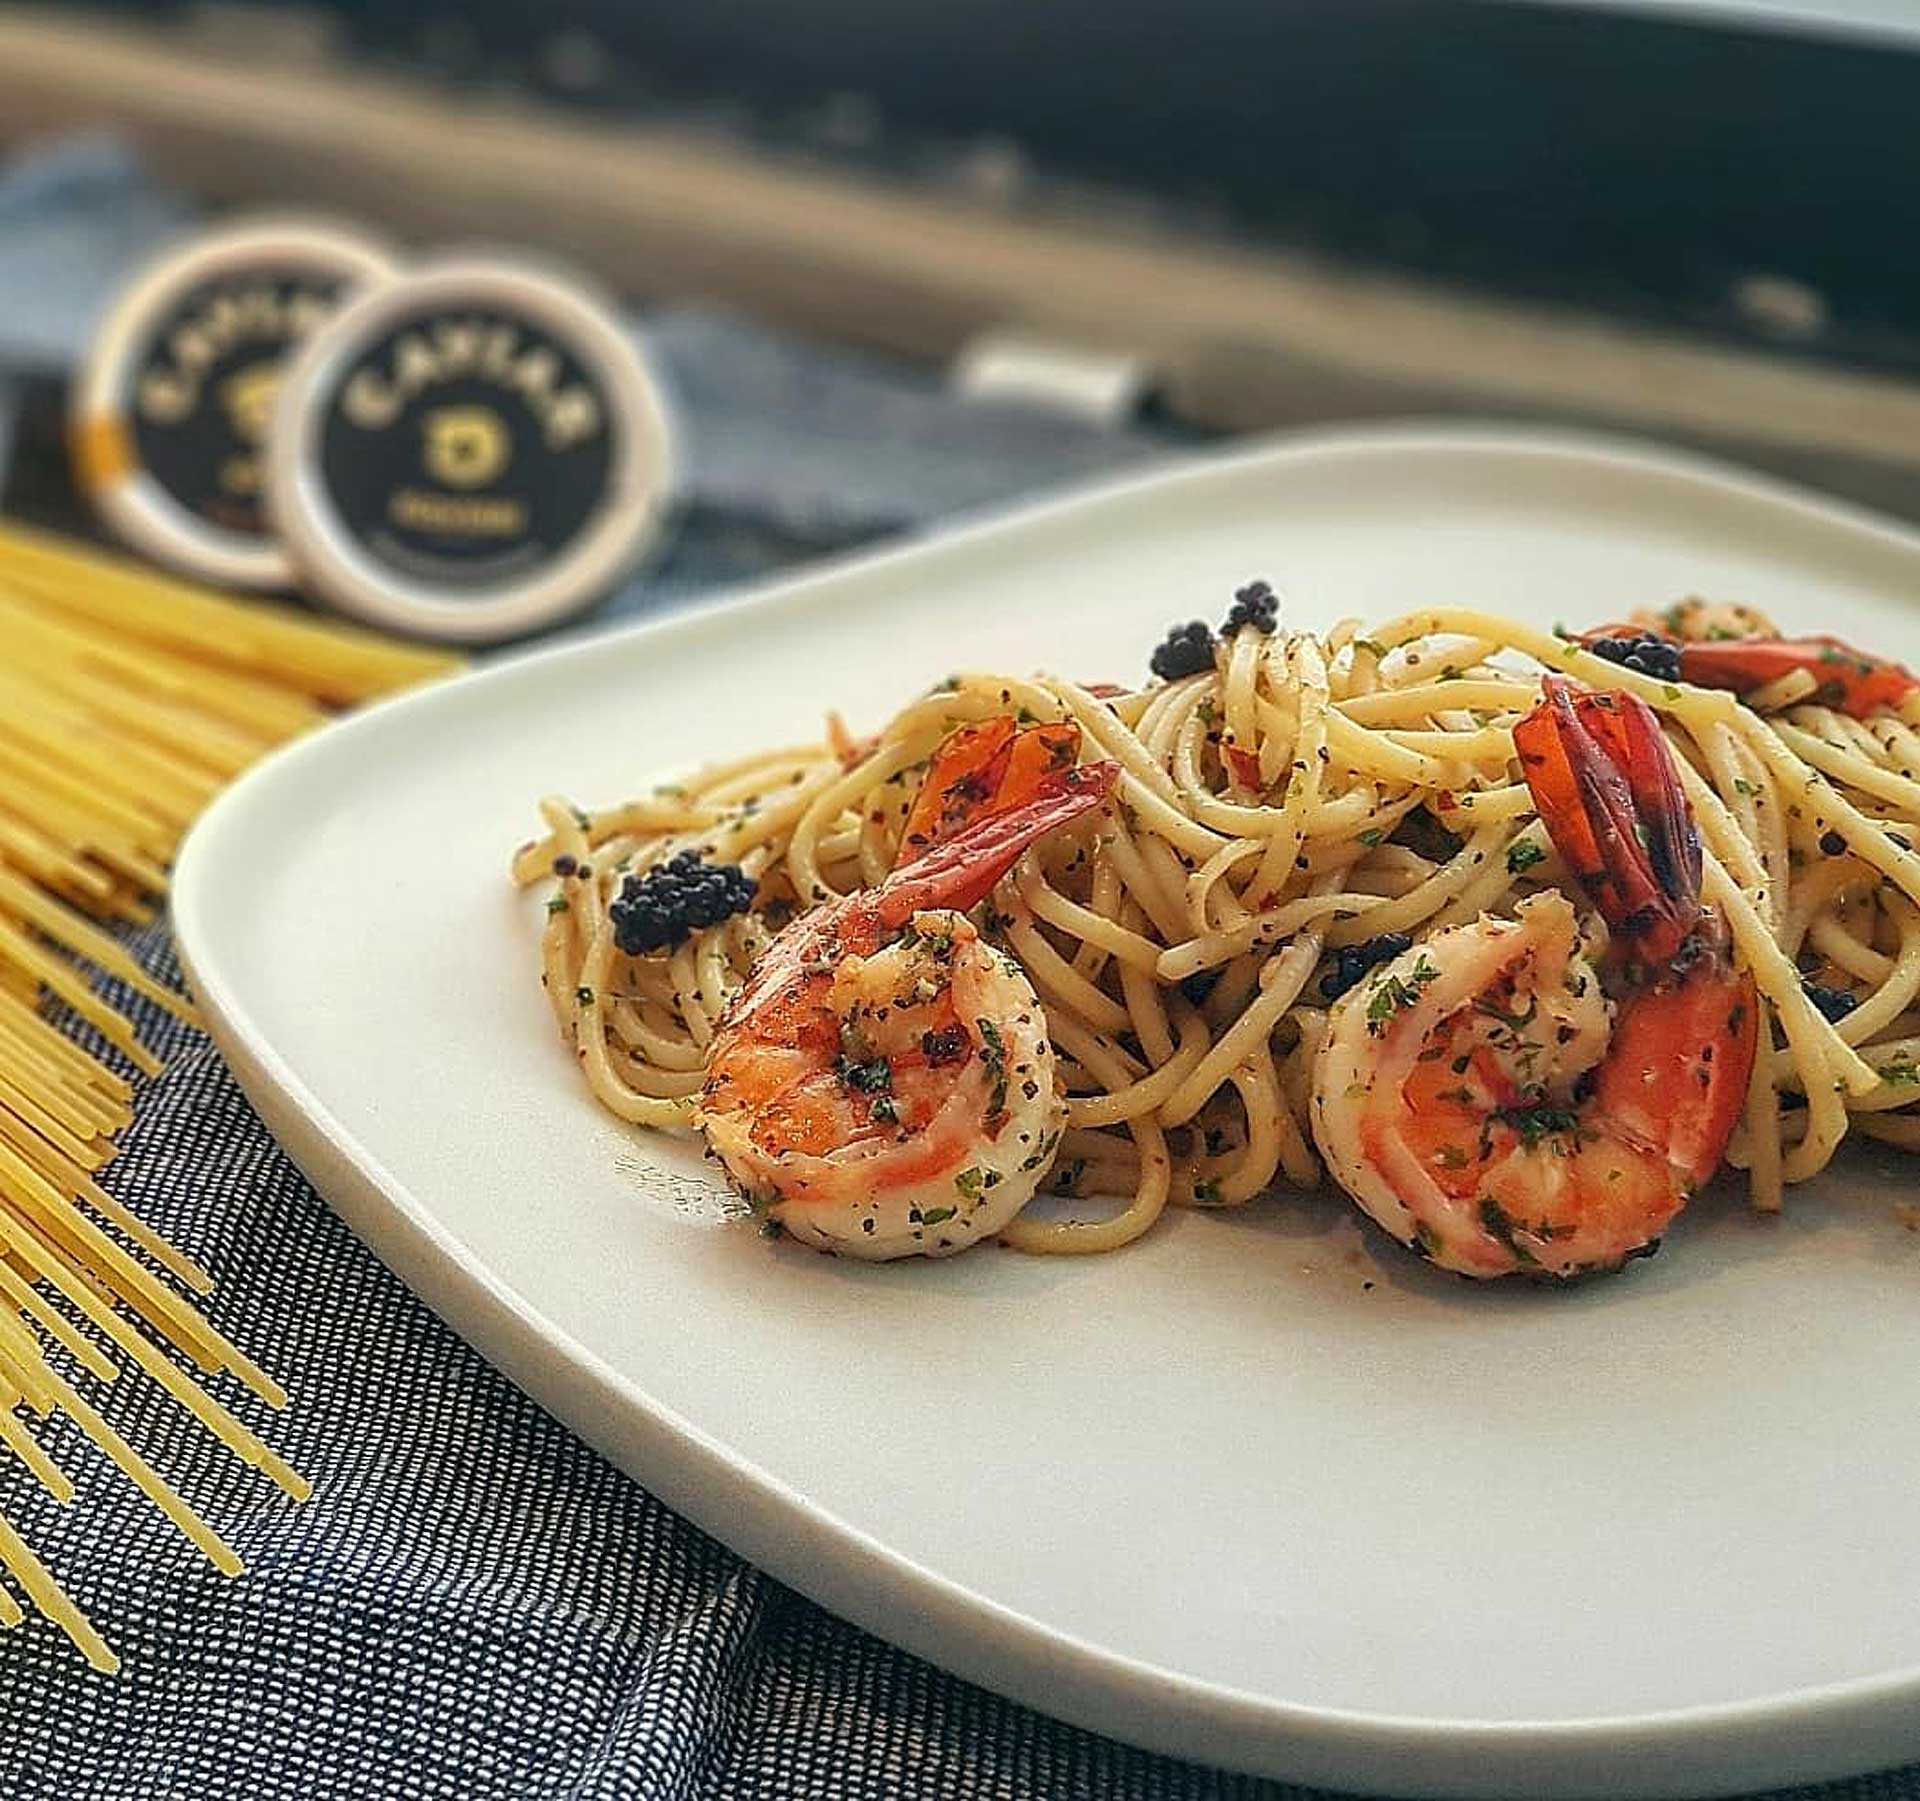 Poseidon Caviar & Seafood Bar